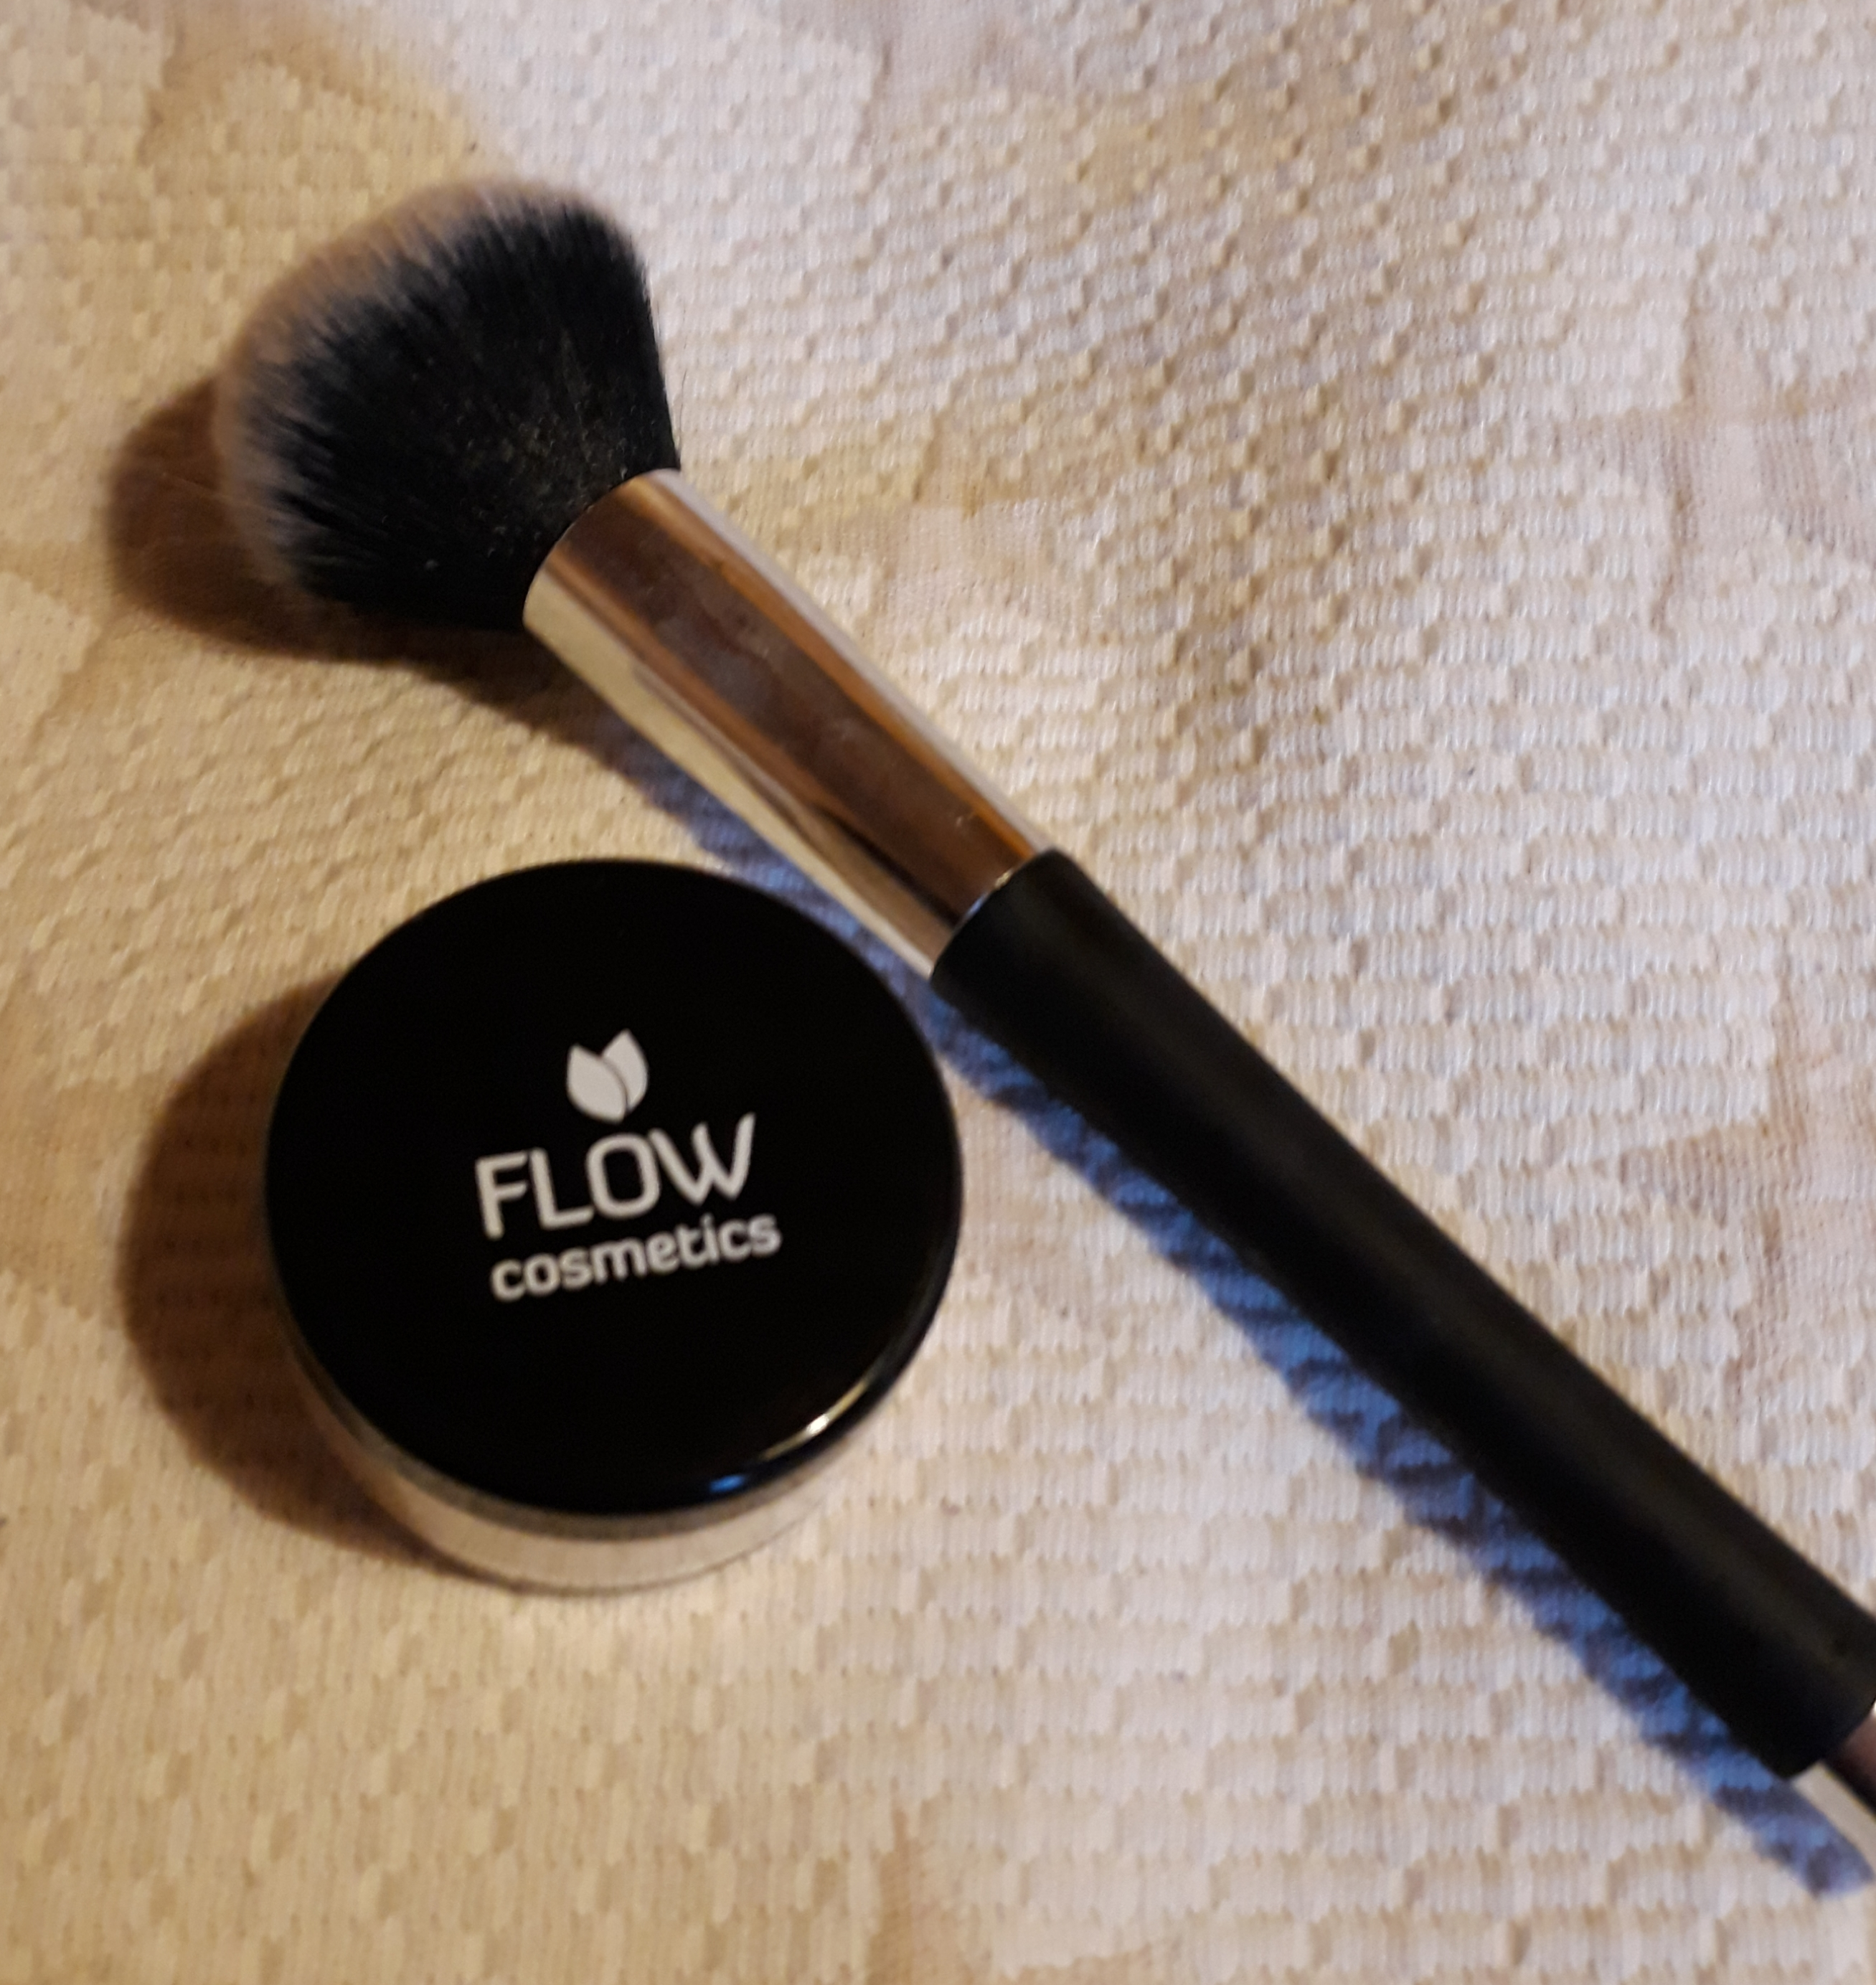 FLOW meikkipuuteri